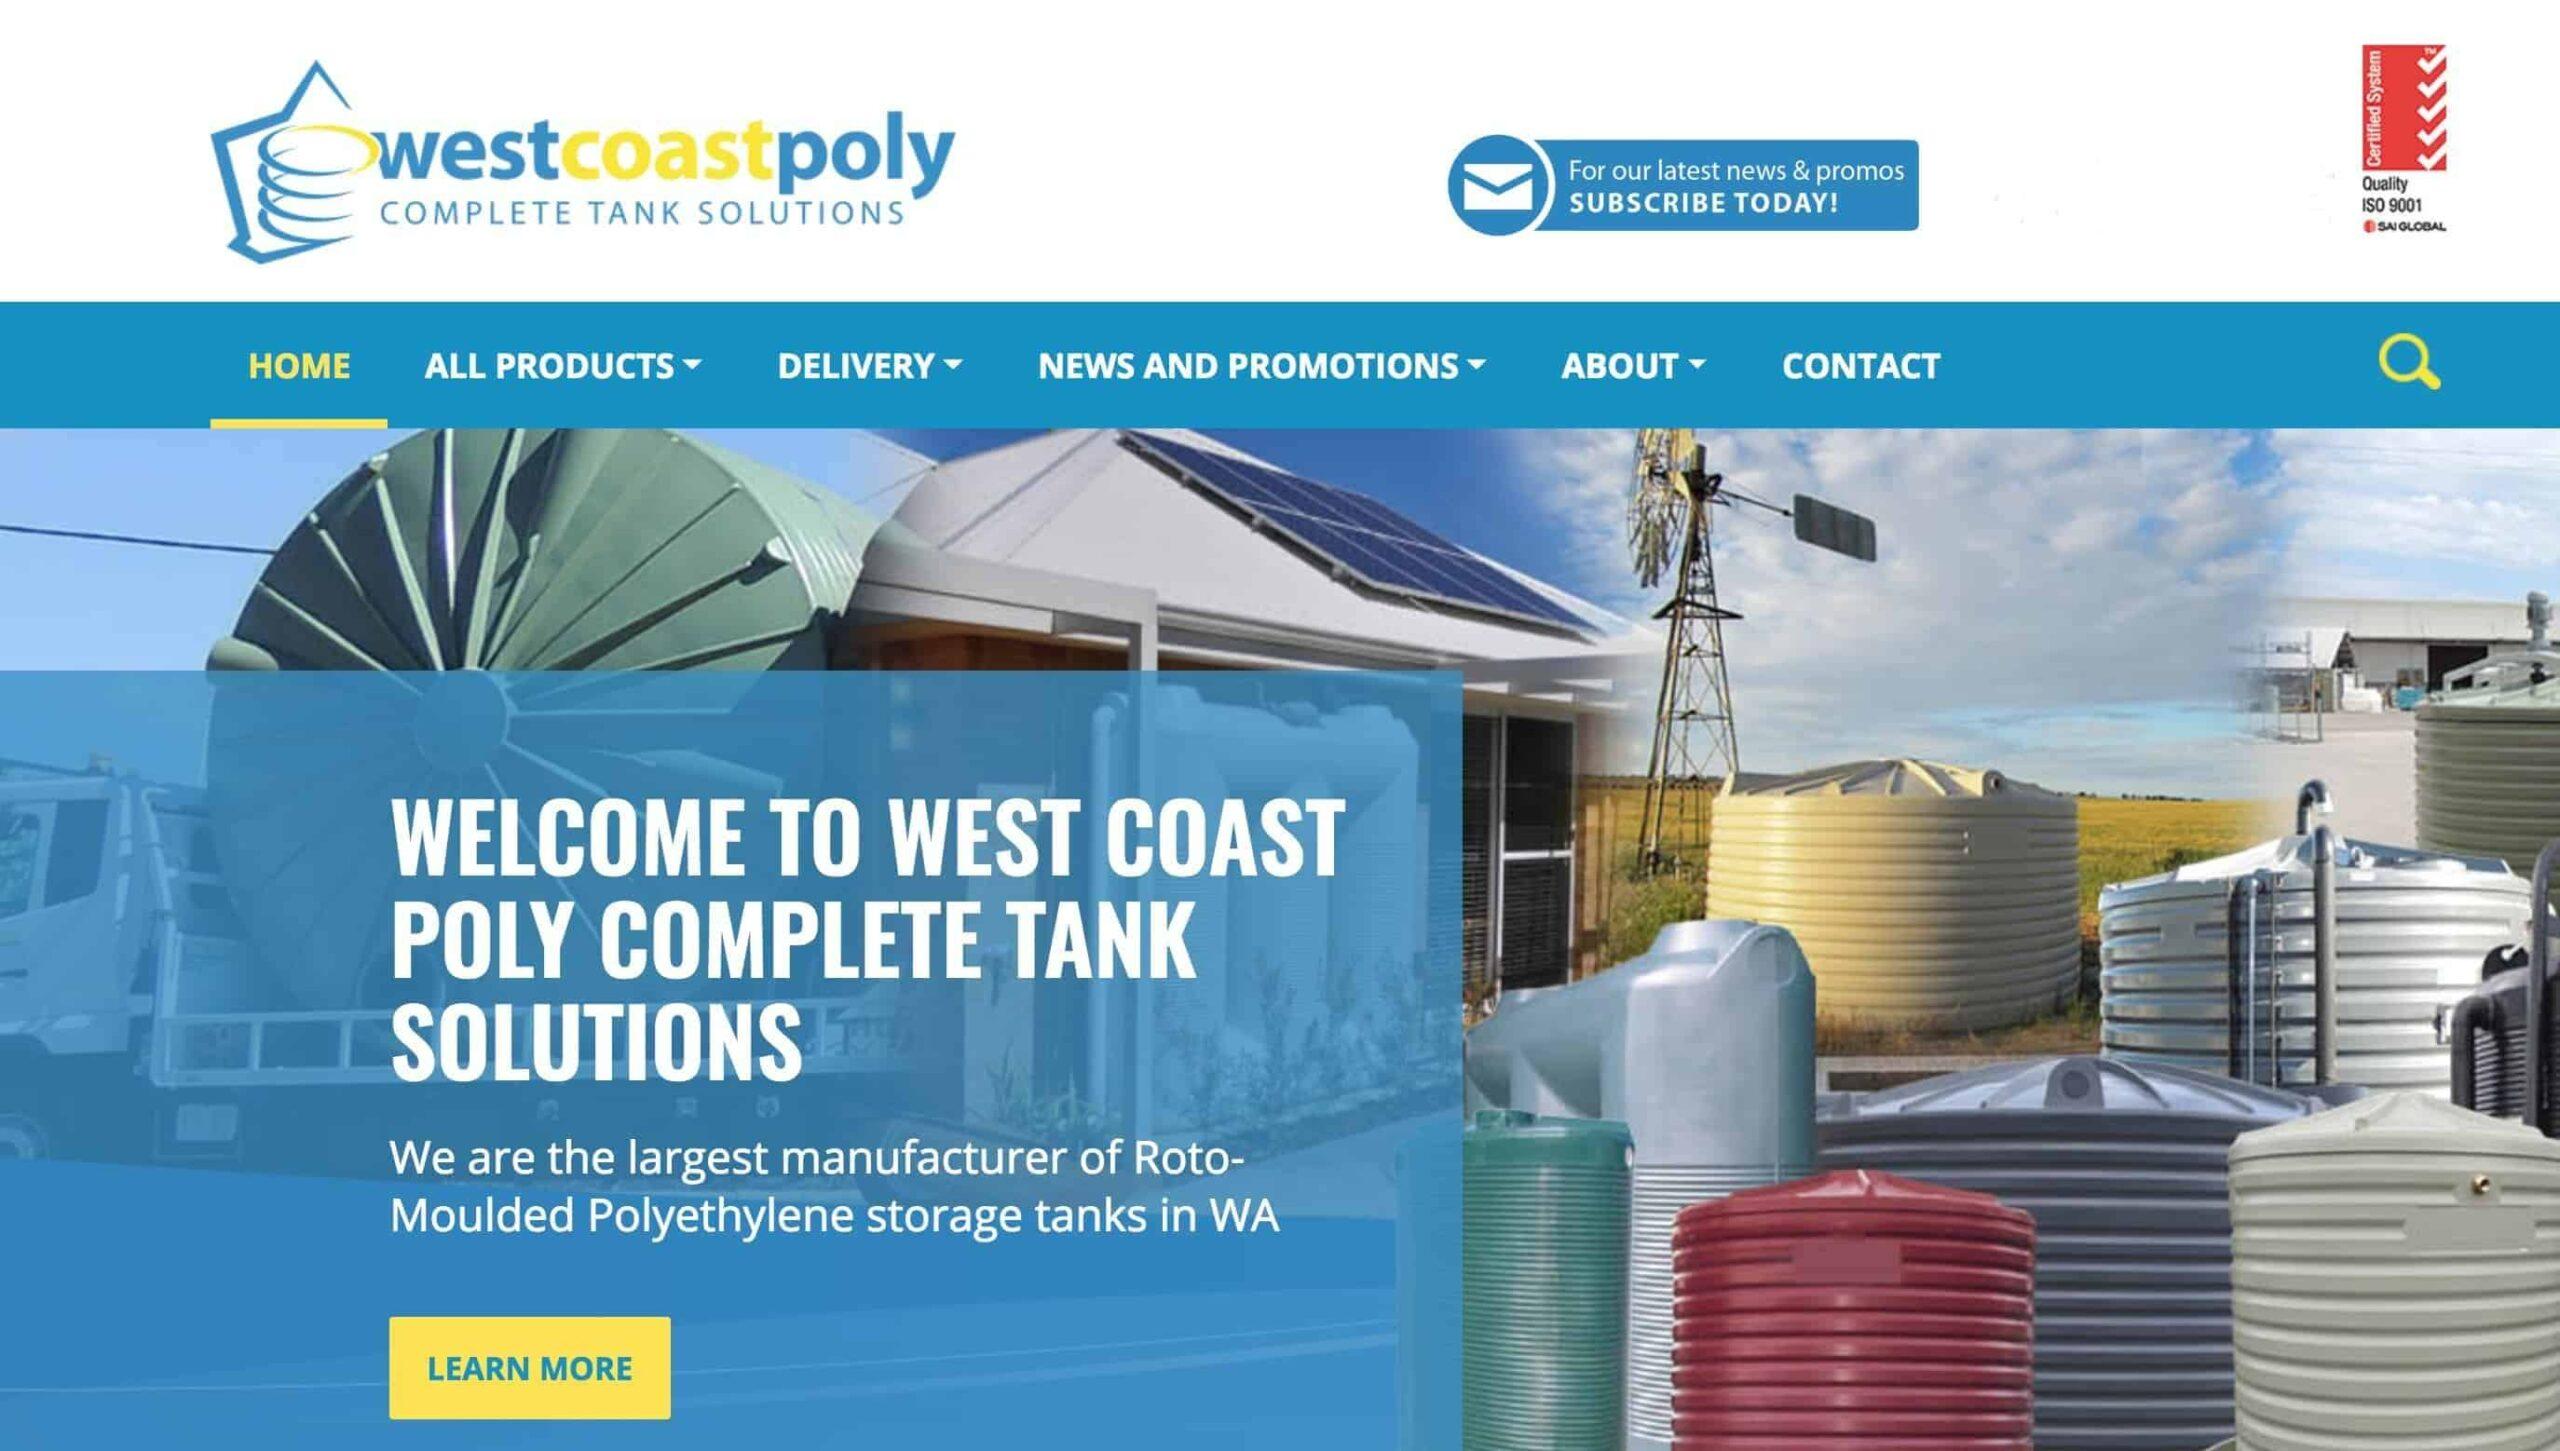 west coast poly website